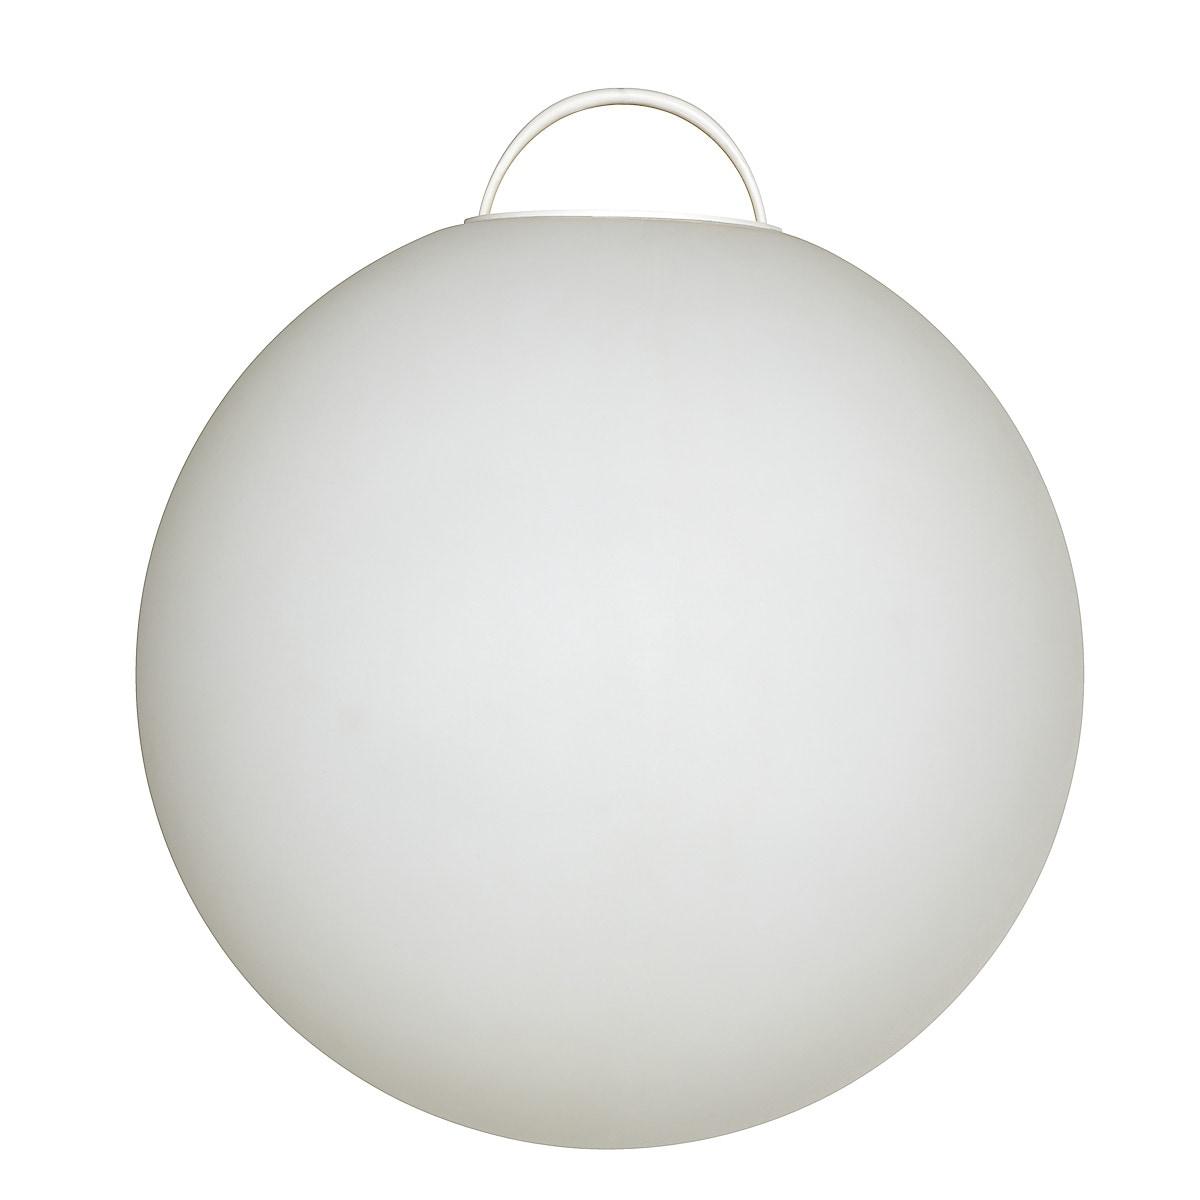 RGB Outdoor/Pool Ball